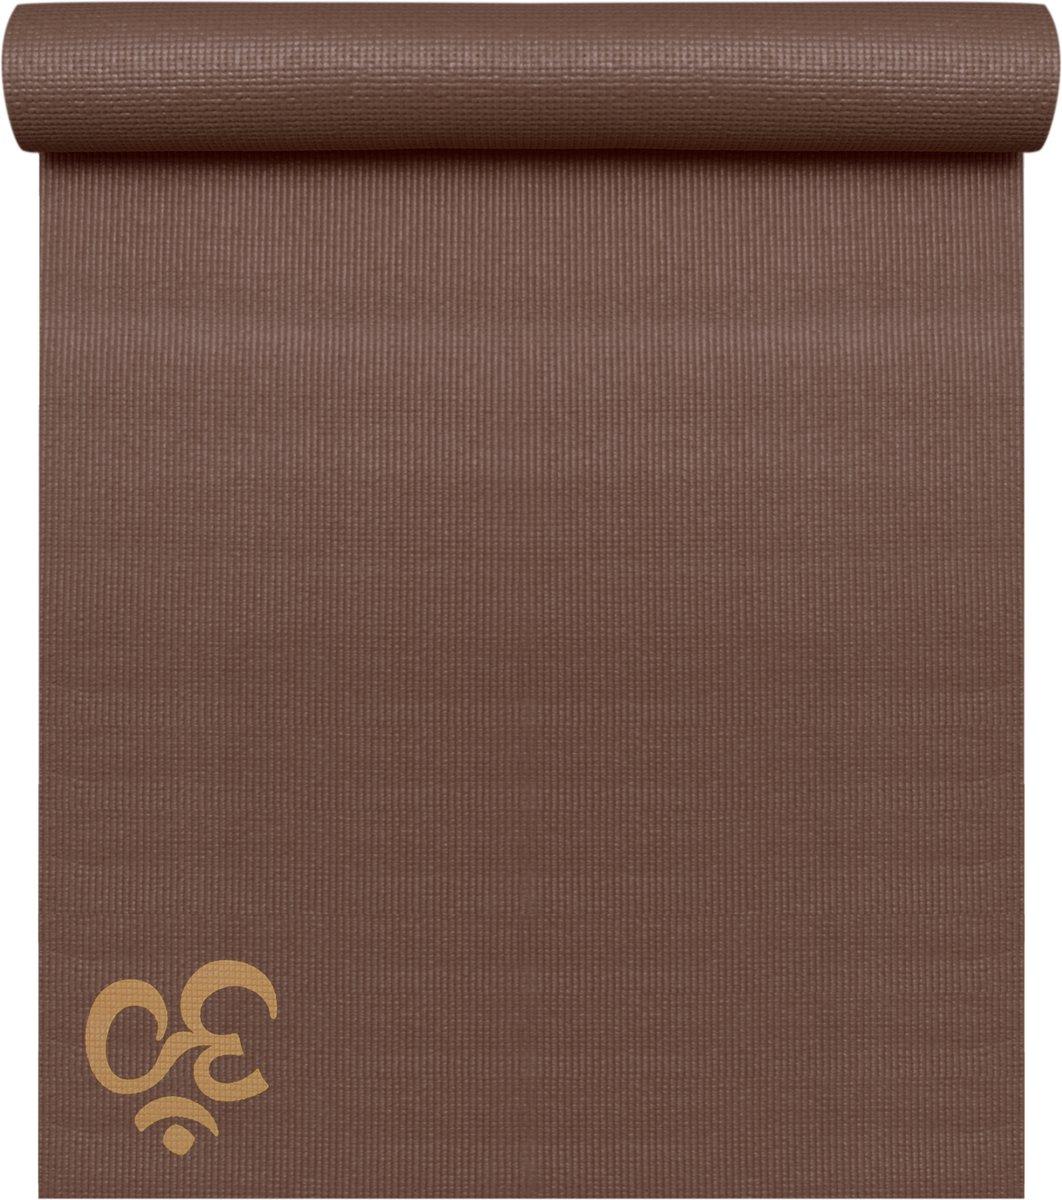 Yogamat basic OM choco brown Fitnessmat YOGISTAR